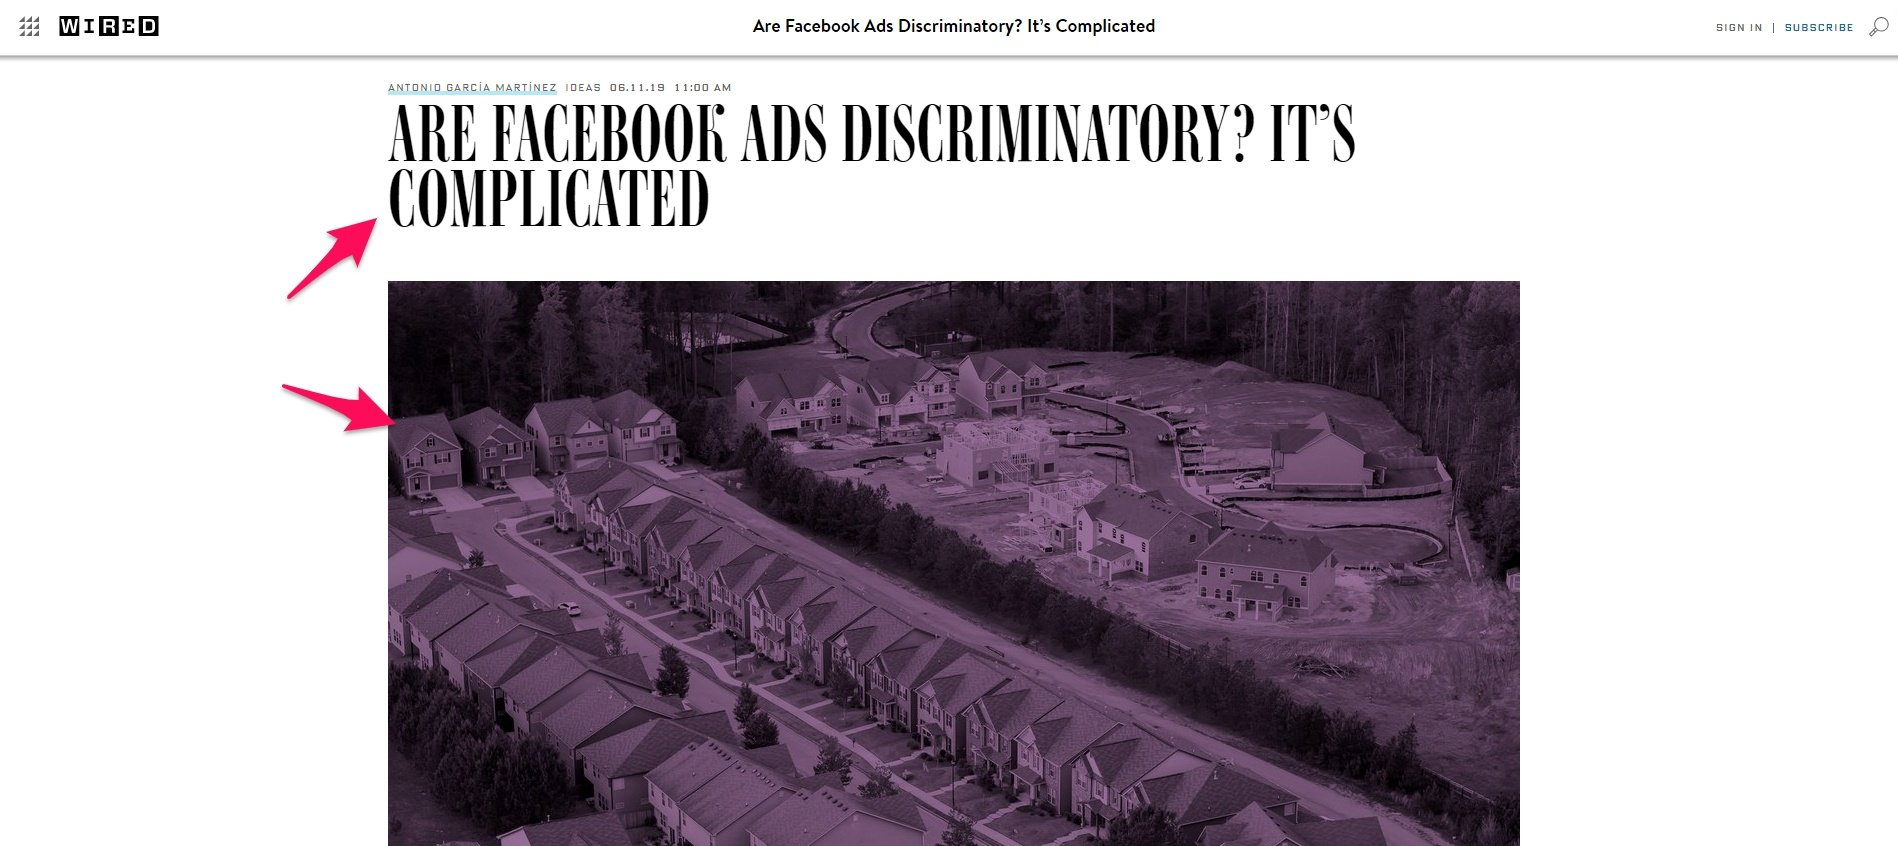 Editorial headline and image